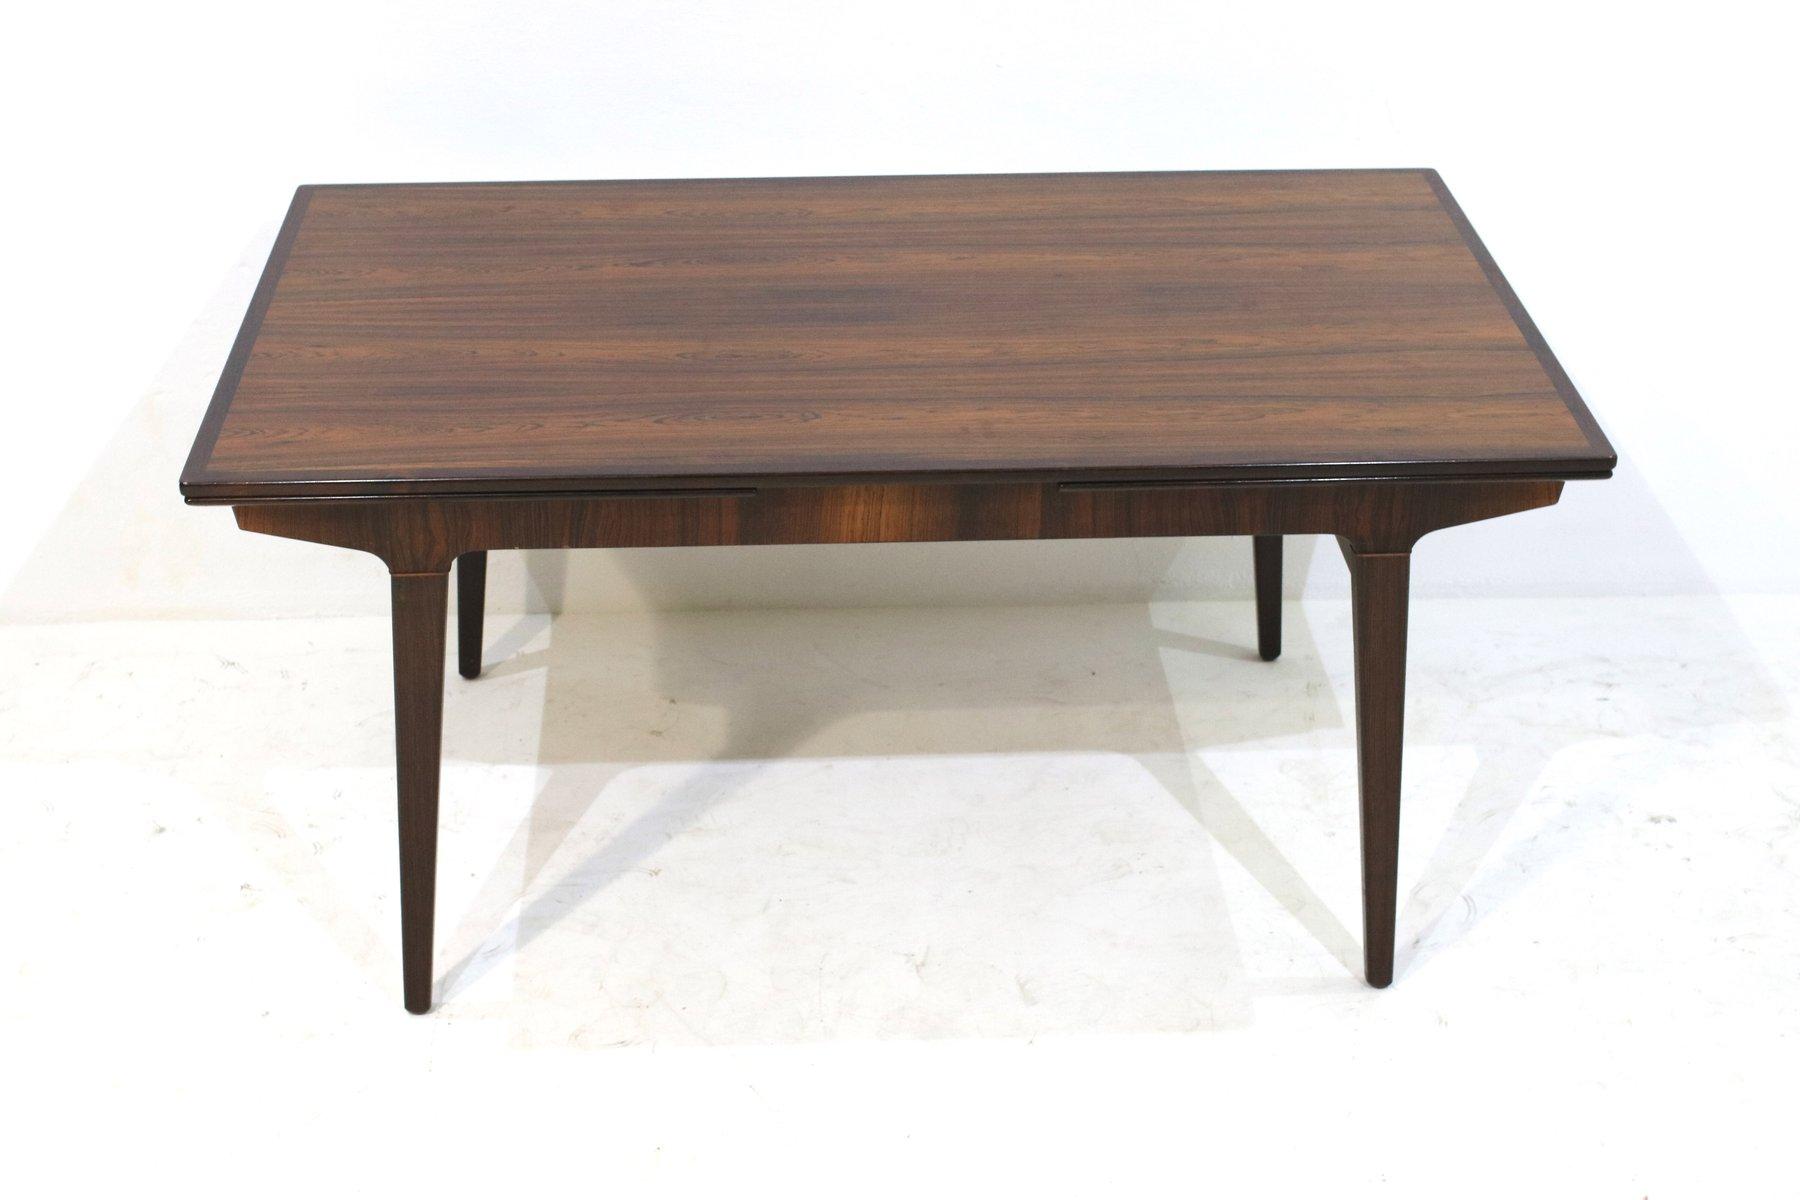 Tavolo Da Pranzo Shabby Chic : Tavolini da salotto shabby chic. tavolo quadrato allungabile shabby